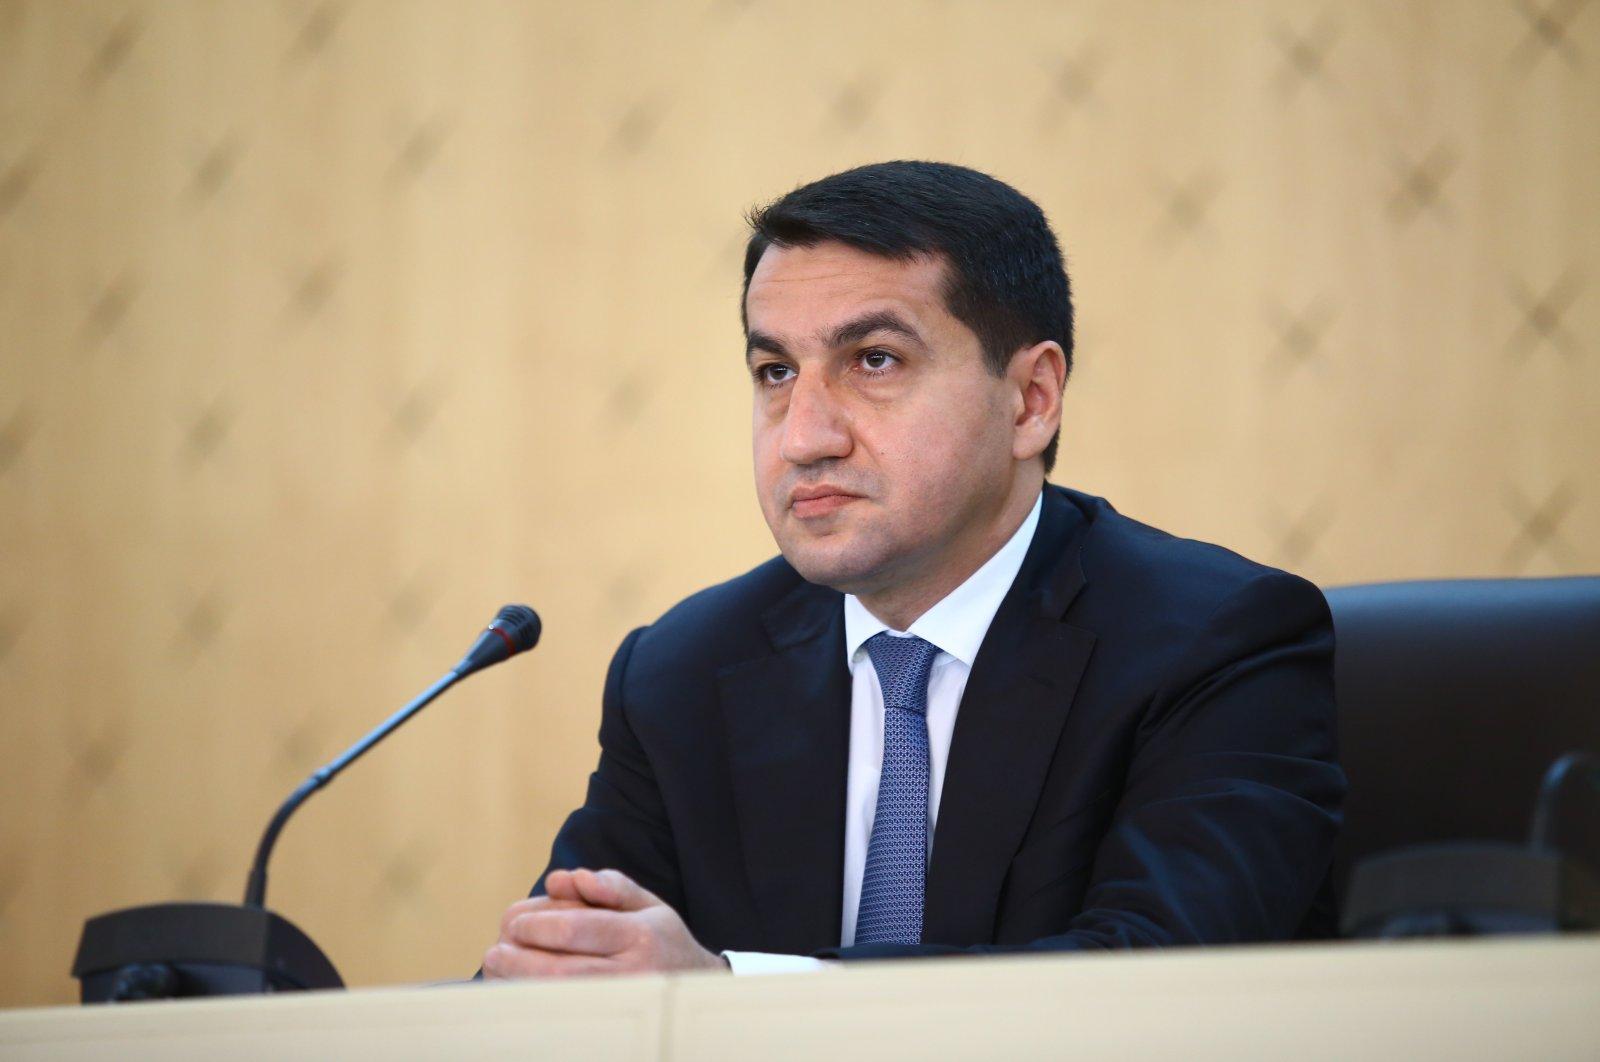 Azerbaijani Presidential aide Hikmet Hajiyev speaks in Baku, Azerbaijan, Oct. 11, 2020. (AA Photo)